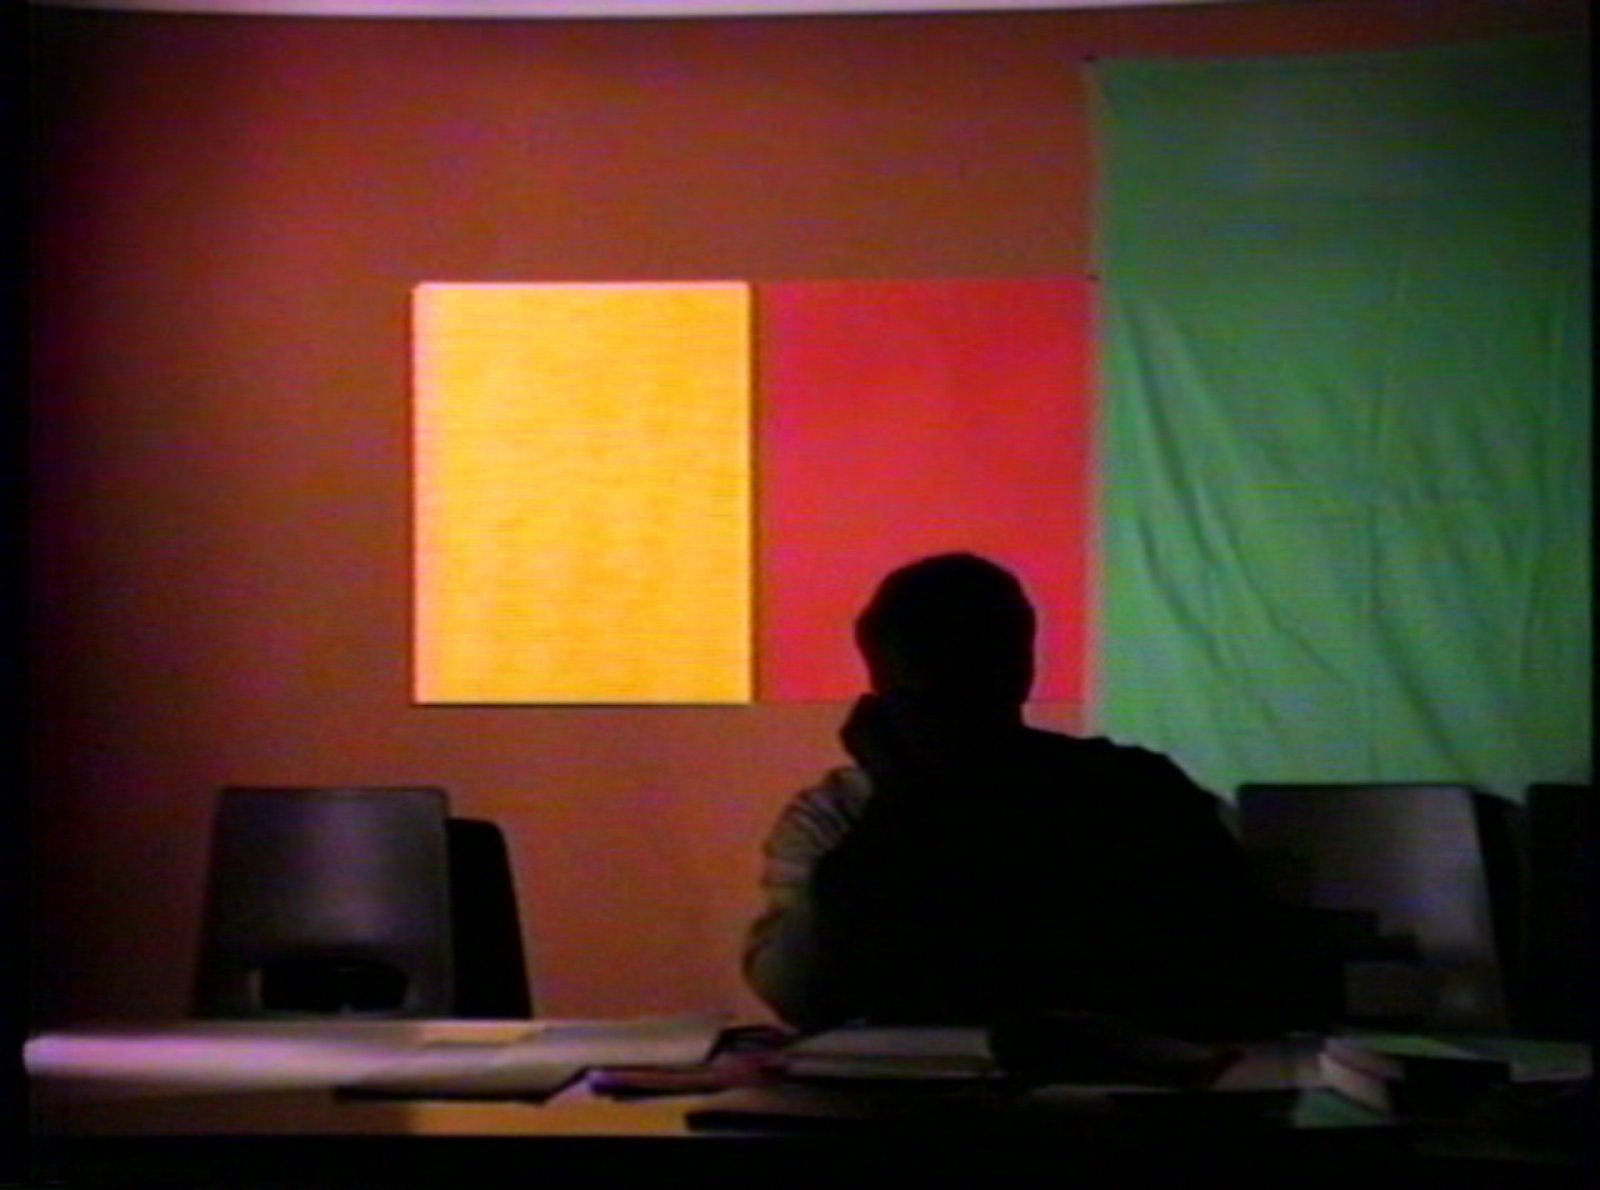 Ian Wallace,Study Corridor(still), 1983, 2 channel video, 3/4 inch video transferred to DVD